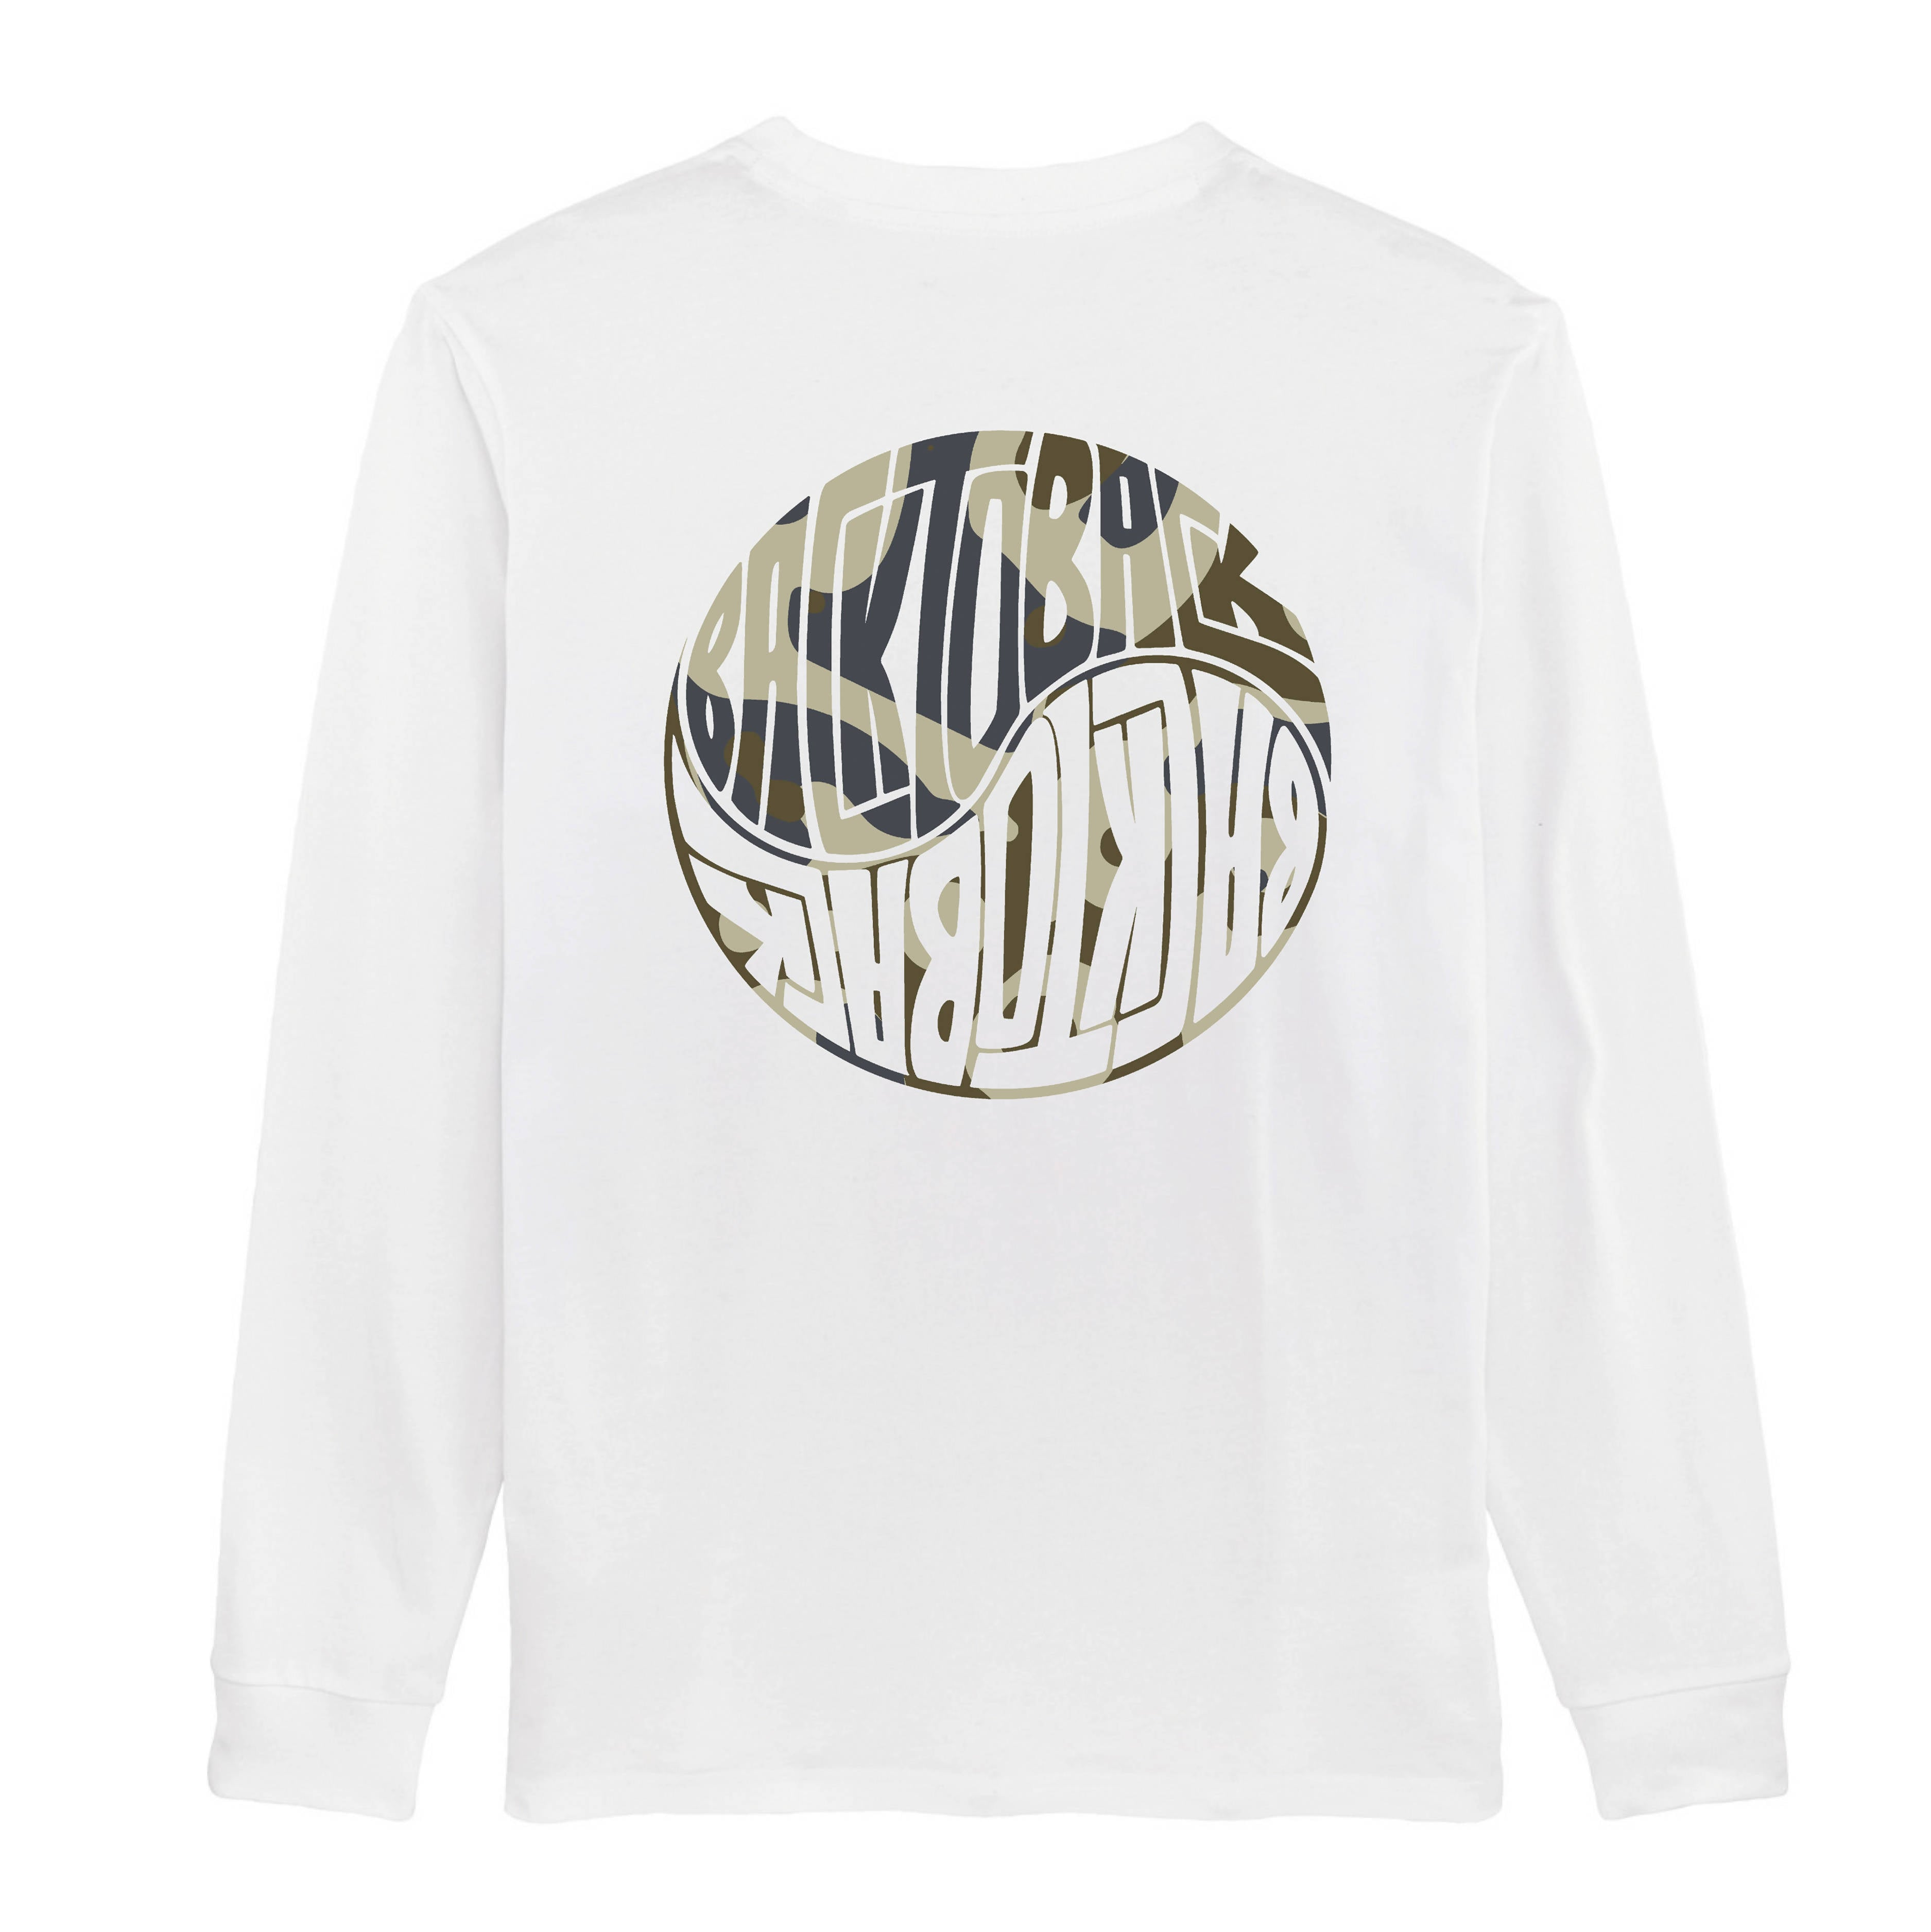 BACKTOBACK White Pattern Longsleeve T-shirt